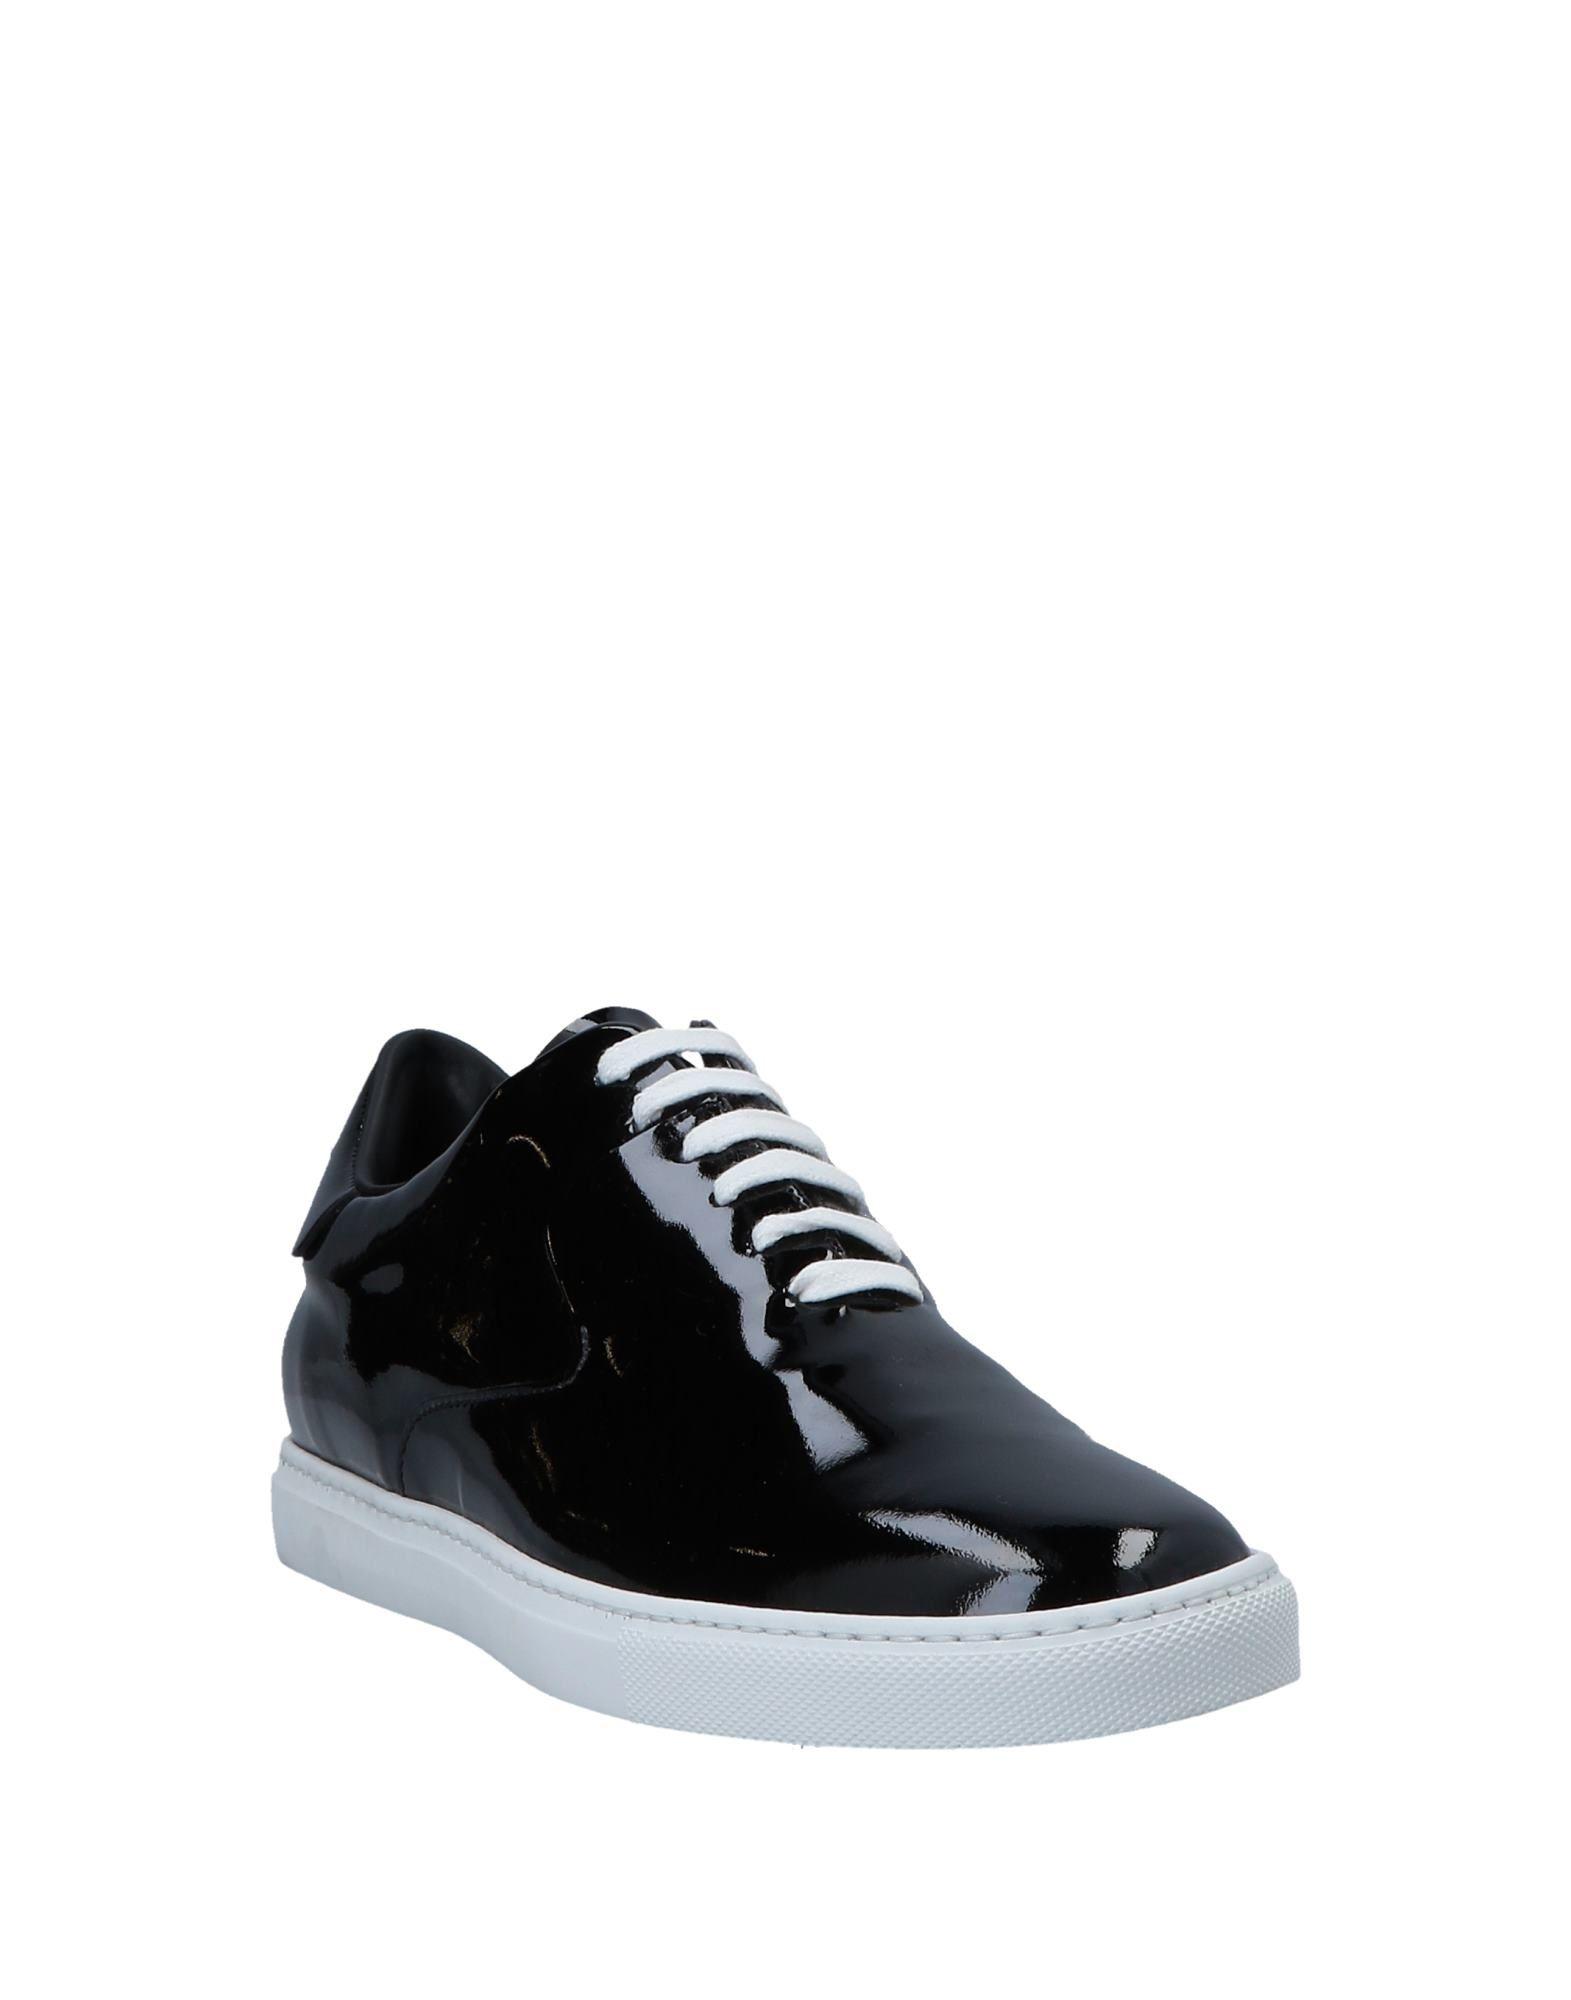 Dsquared2 Sneakers Herren  11553855GI Schuhe Gute Qualität beliebte Schuhe 11553855GI 0cfe7c